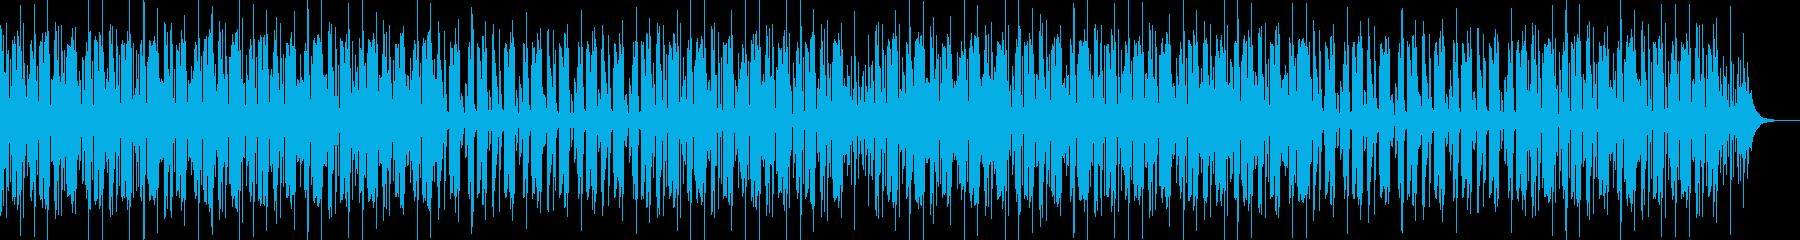 YouTube楽しいエンディングEDMの再生済みの波形